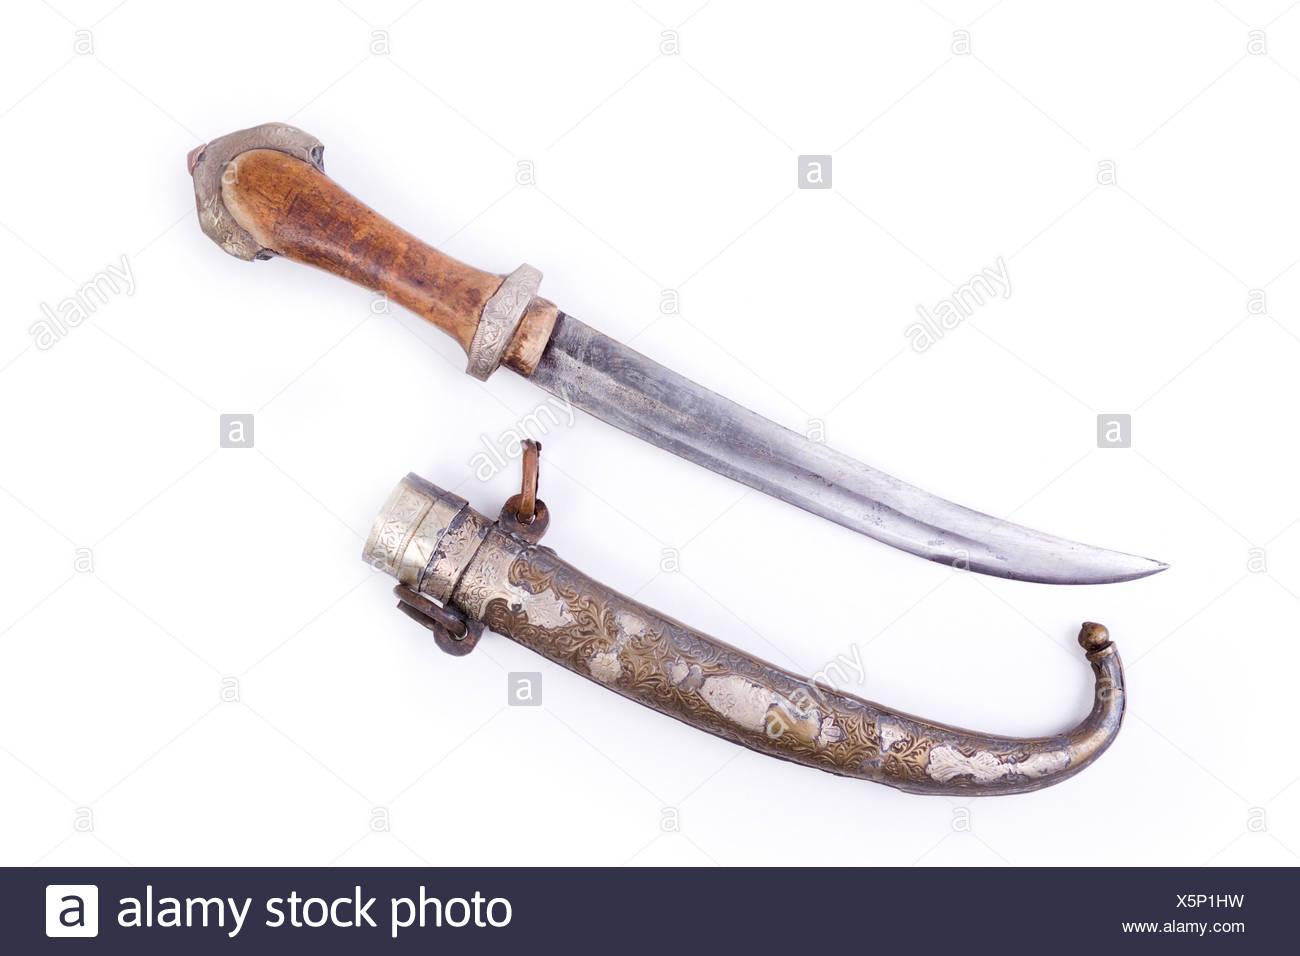 Morocco dagger, 19. century Stock Photo